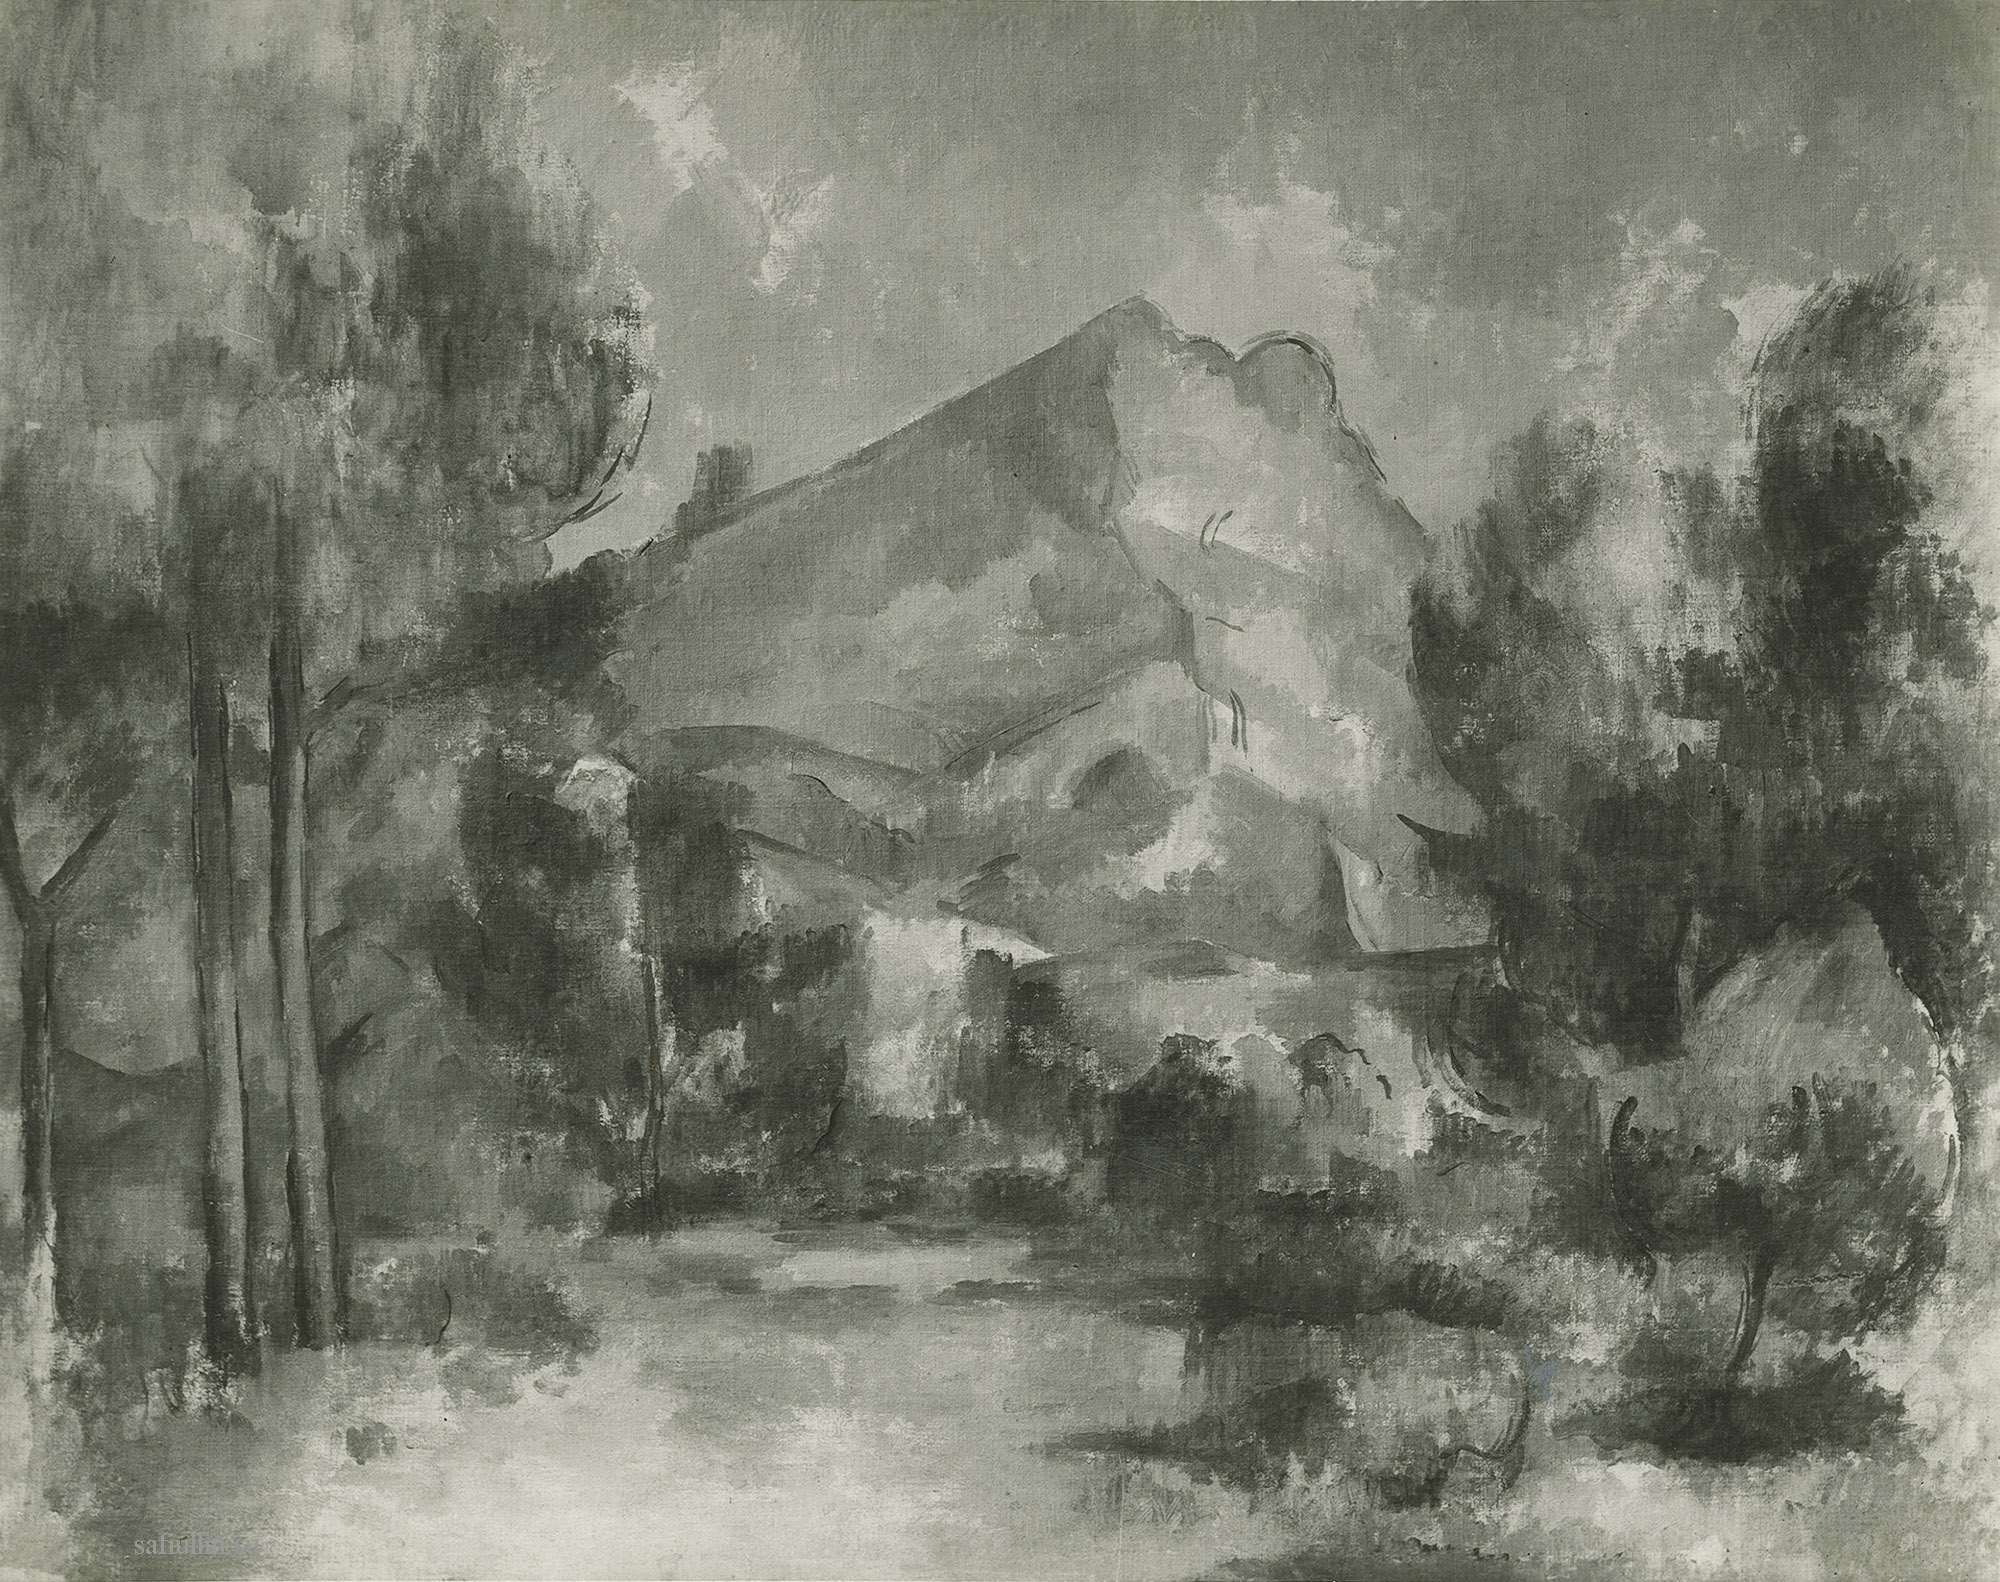 Сезанн картина Montagne Sainte Victoire 1897 пейзажи природы Сафиуллин